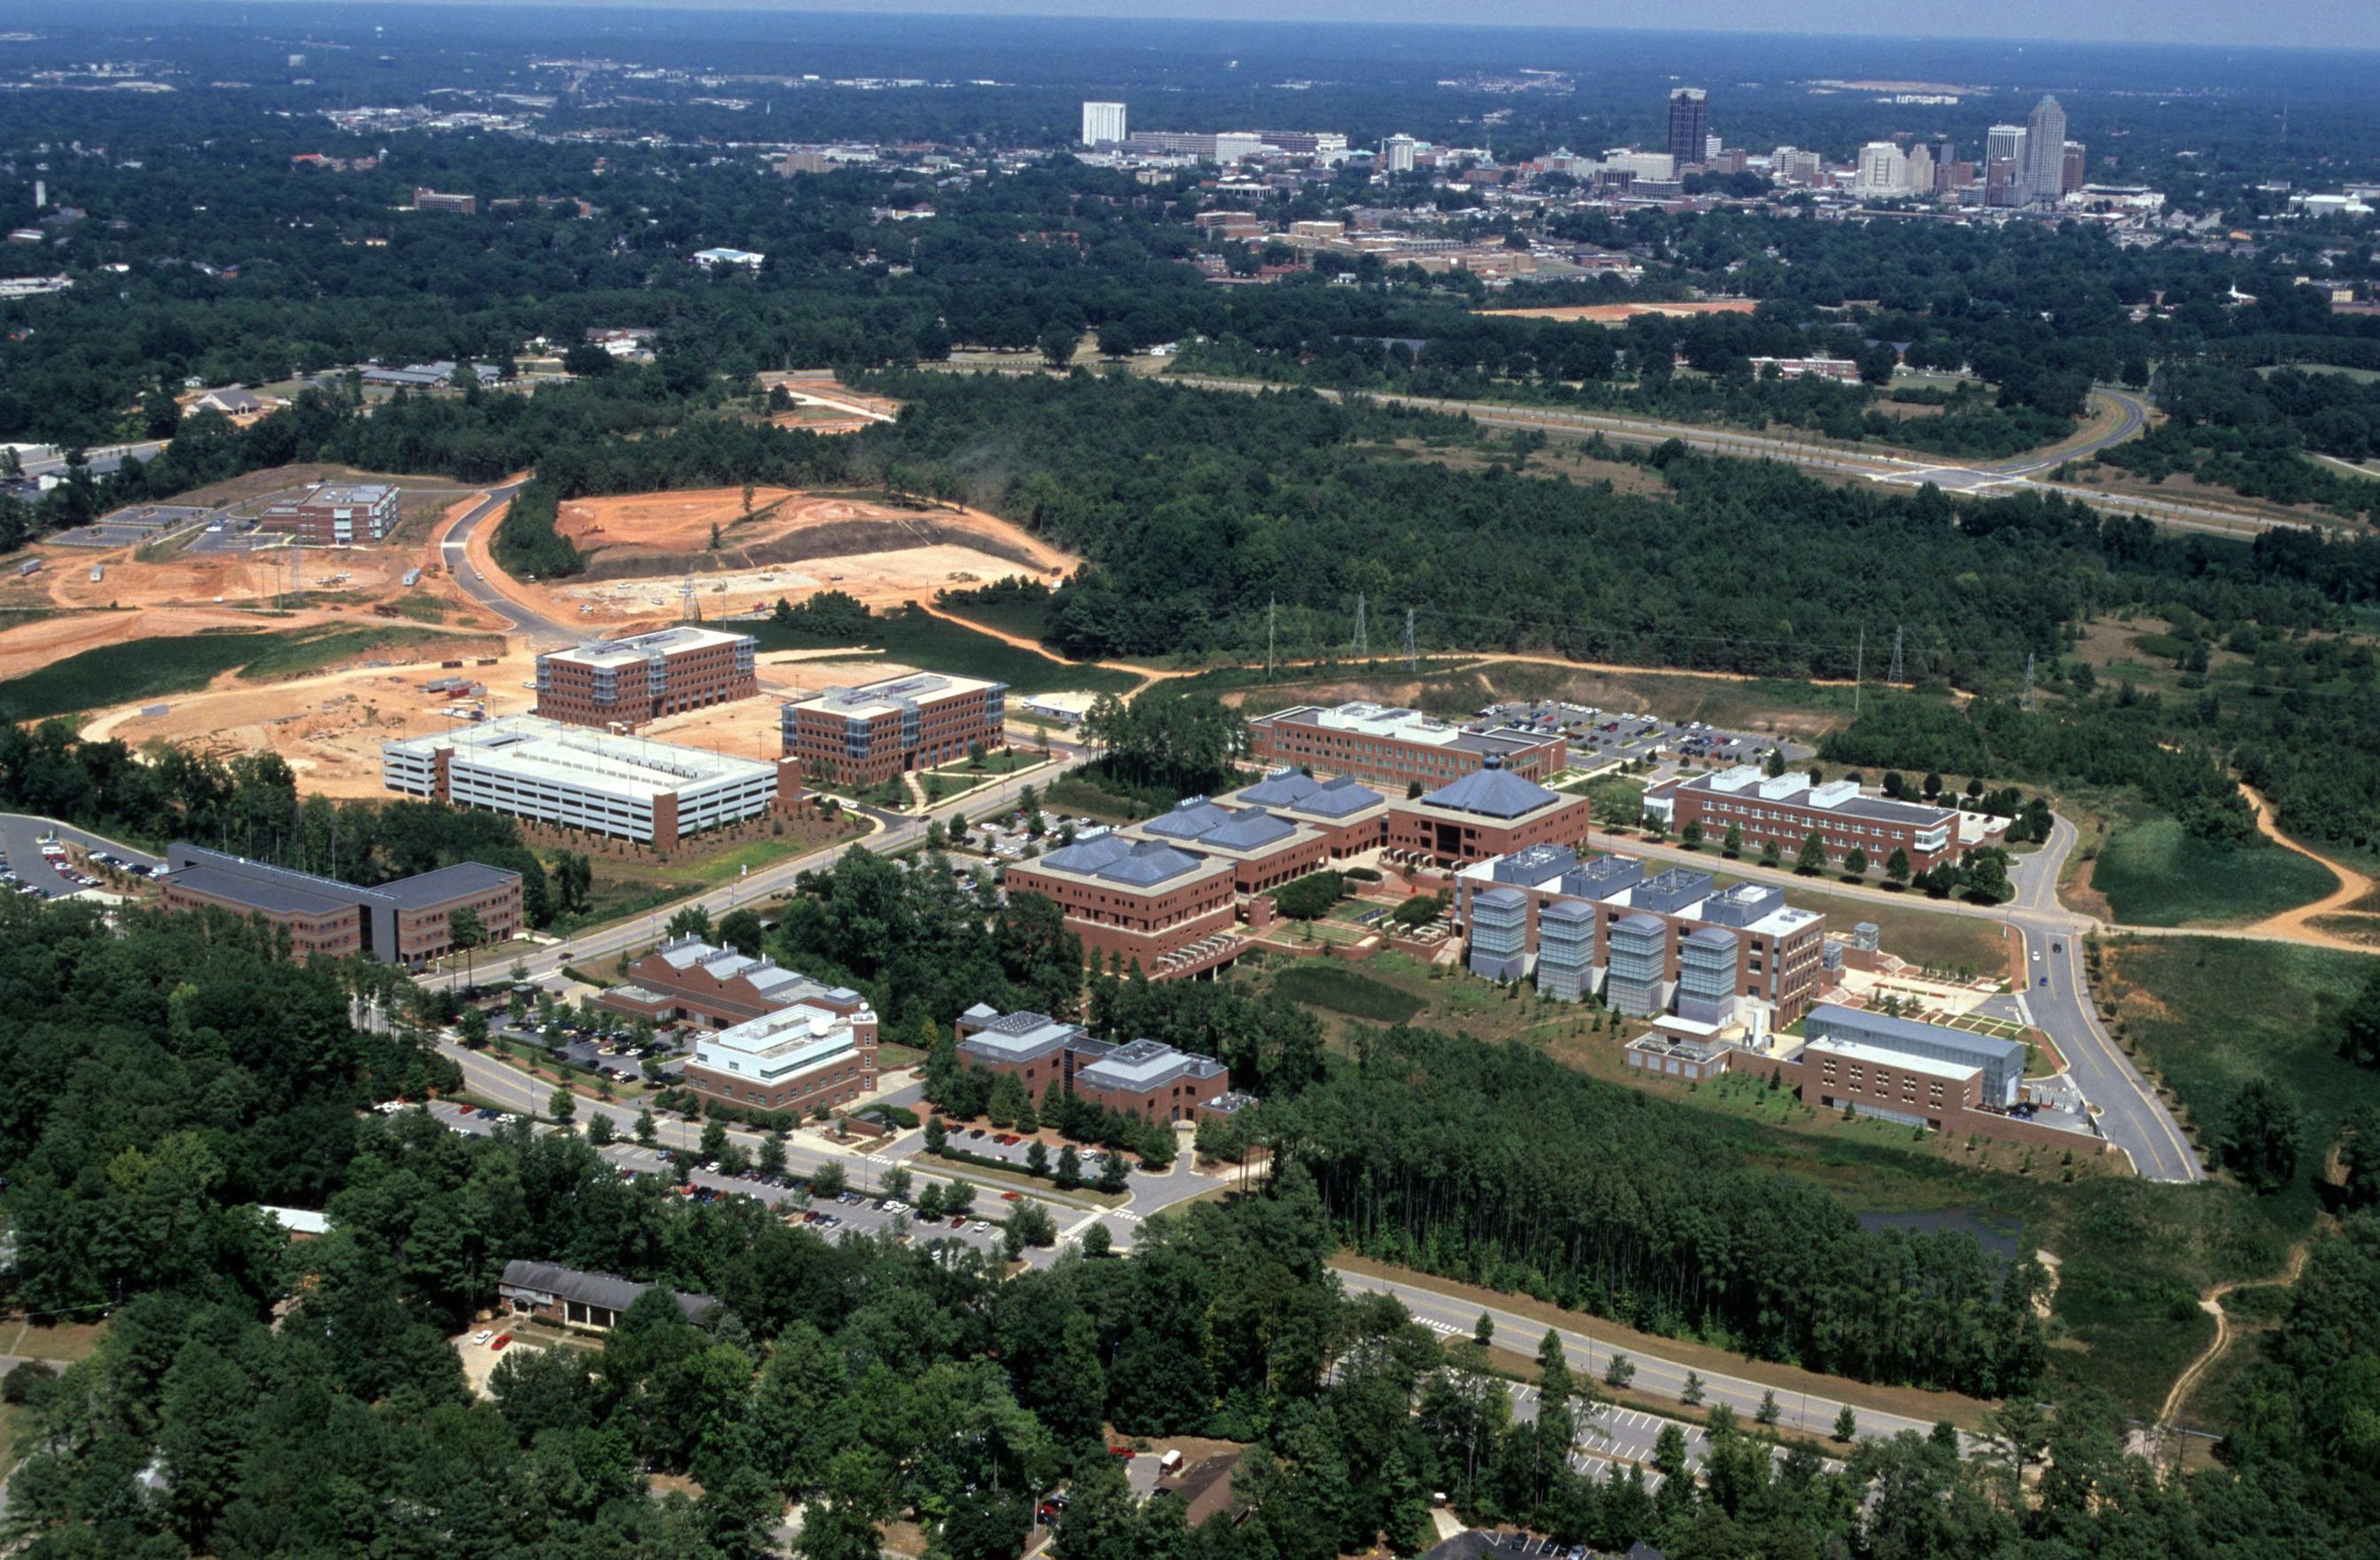 University of North Carolina Campus Campus North Carolina